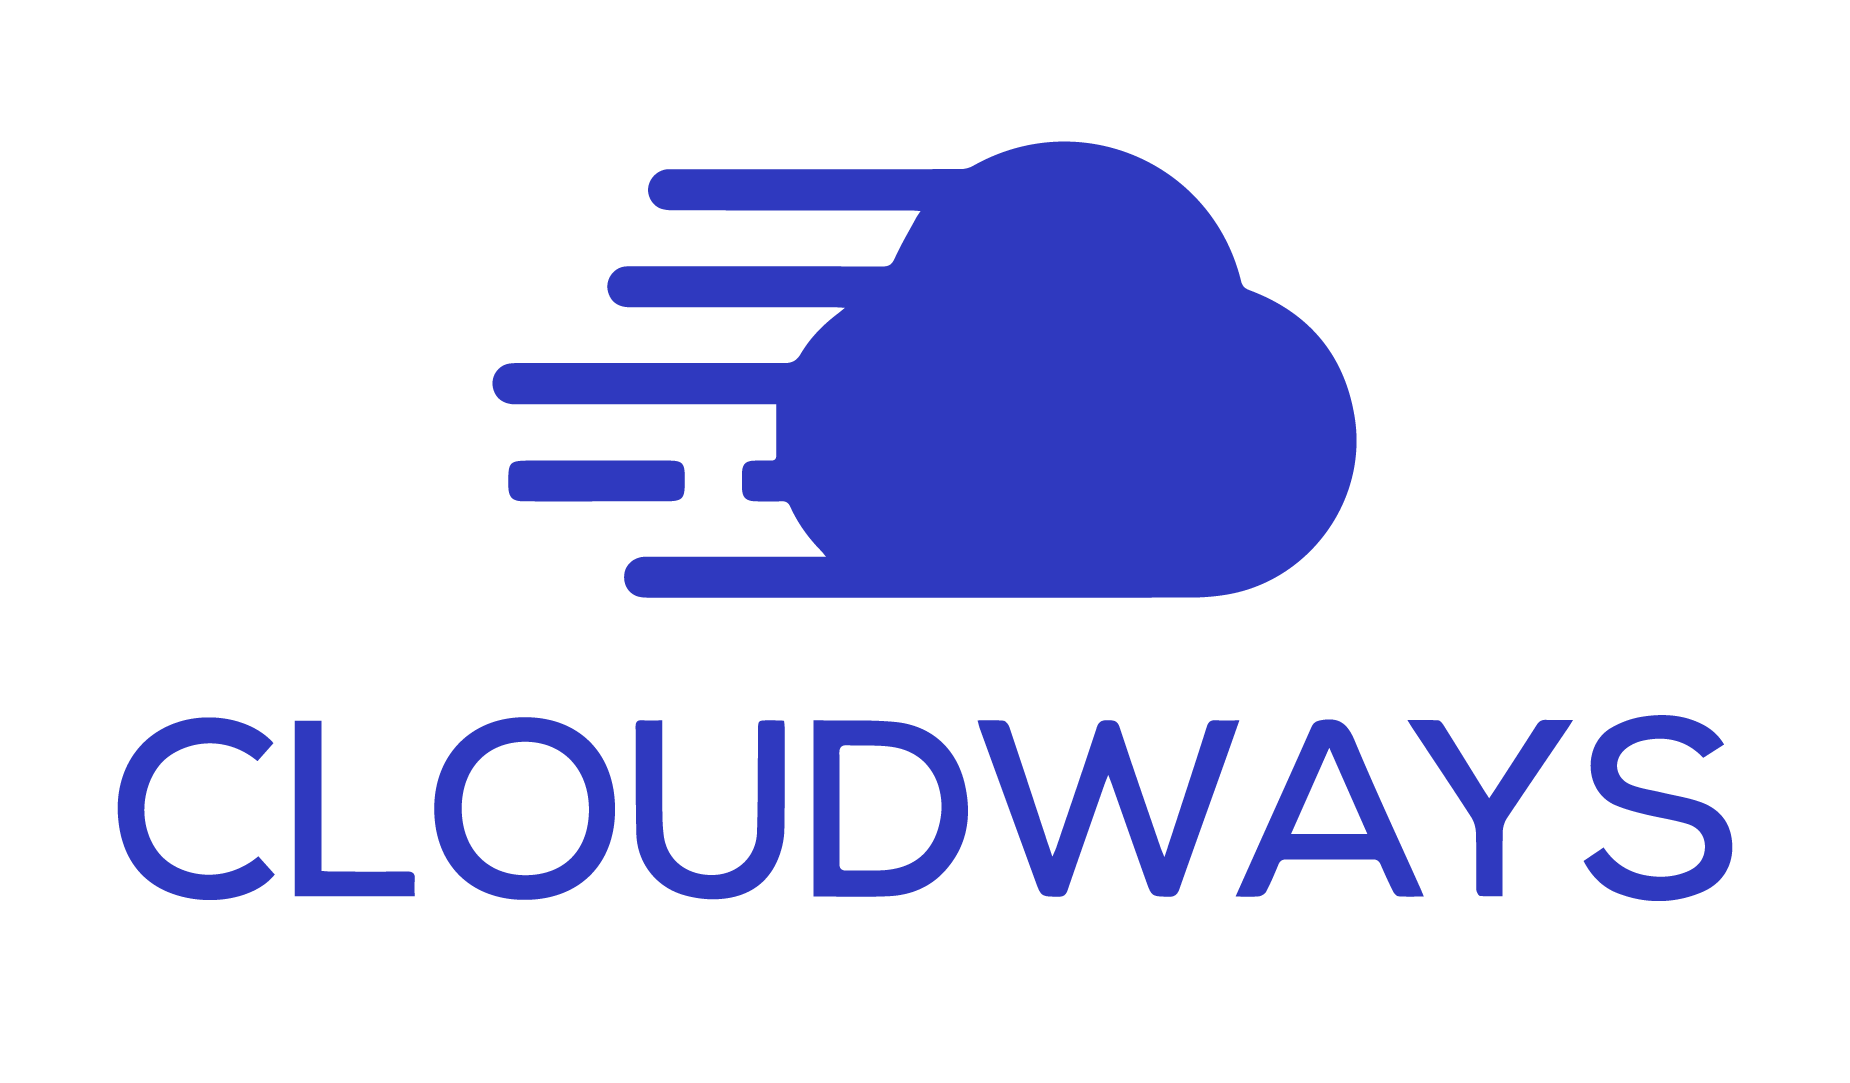 cloudways-logo-for-bluehost-alternatives